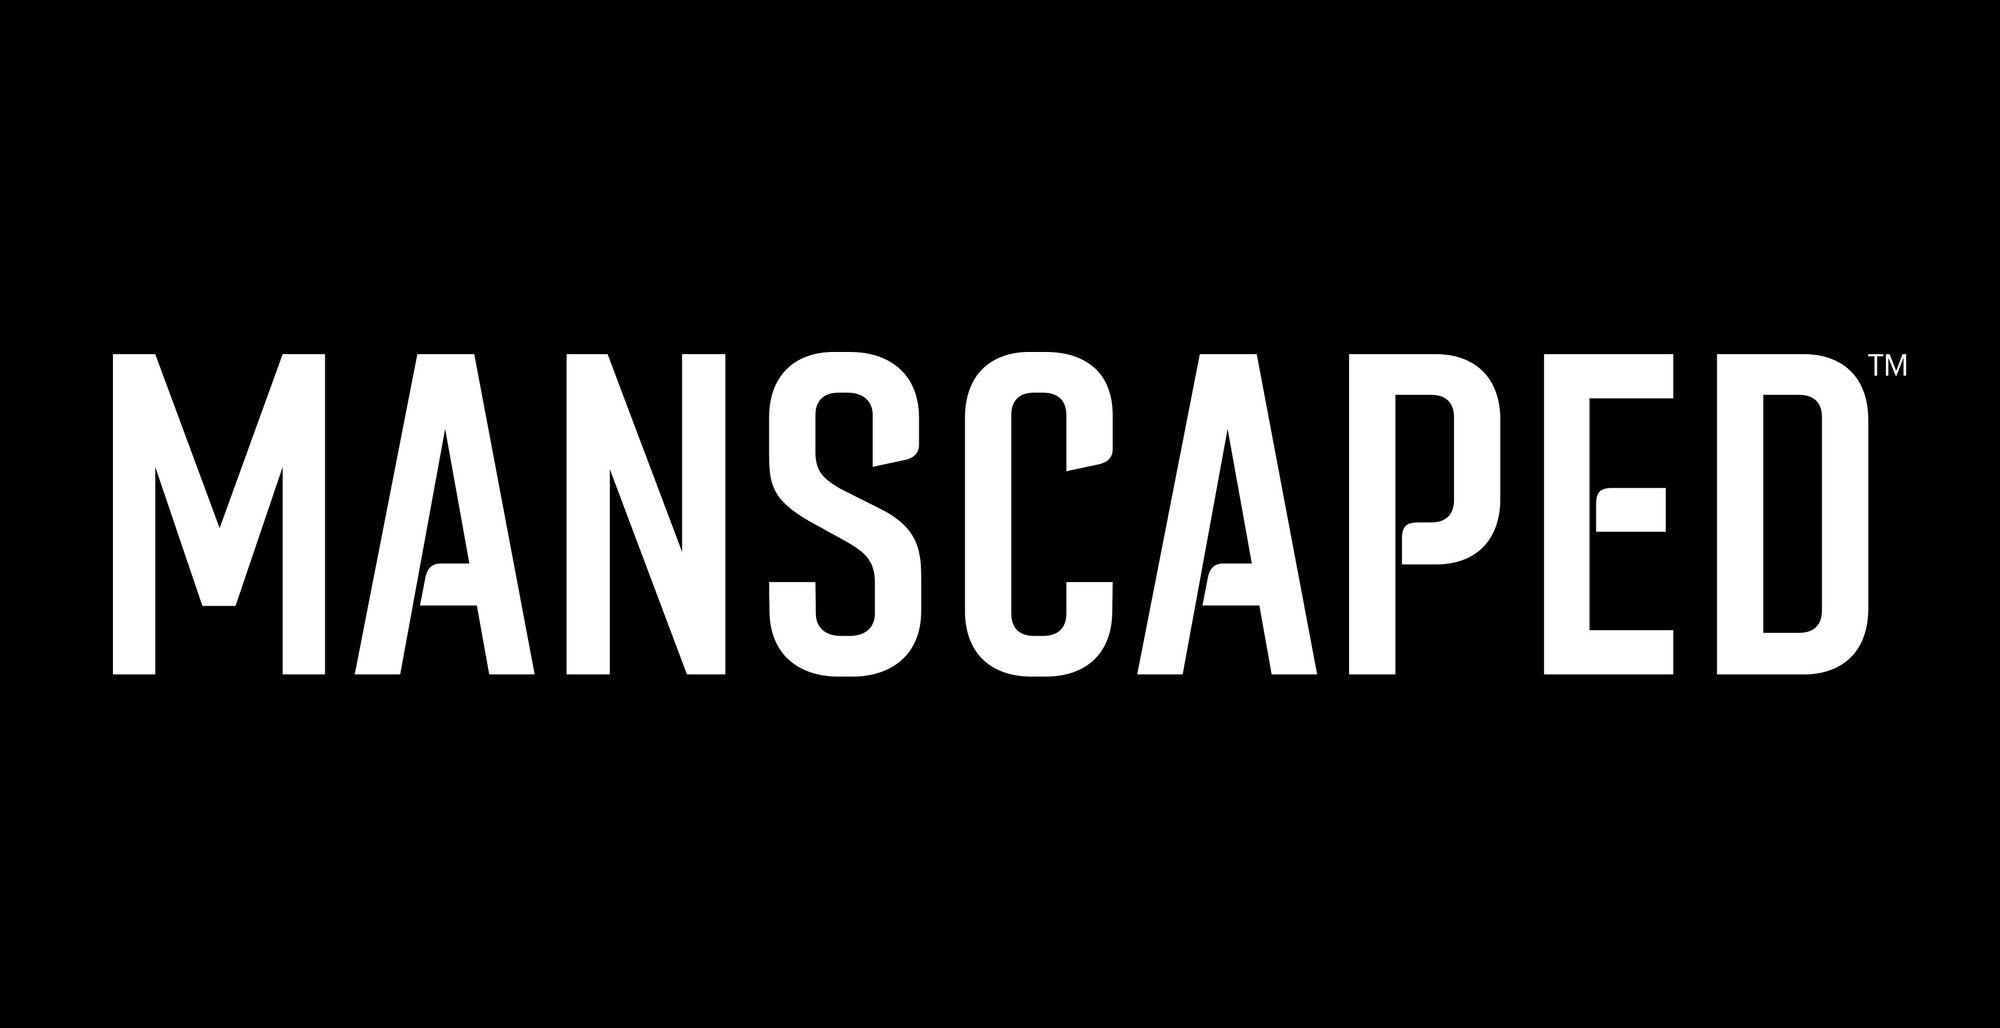 Manscaped Logo